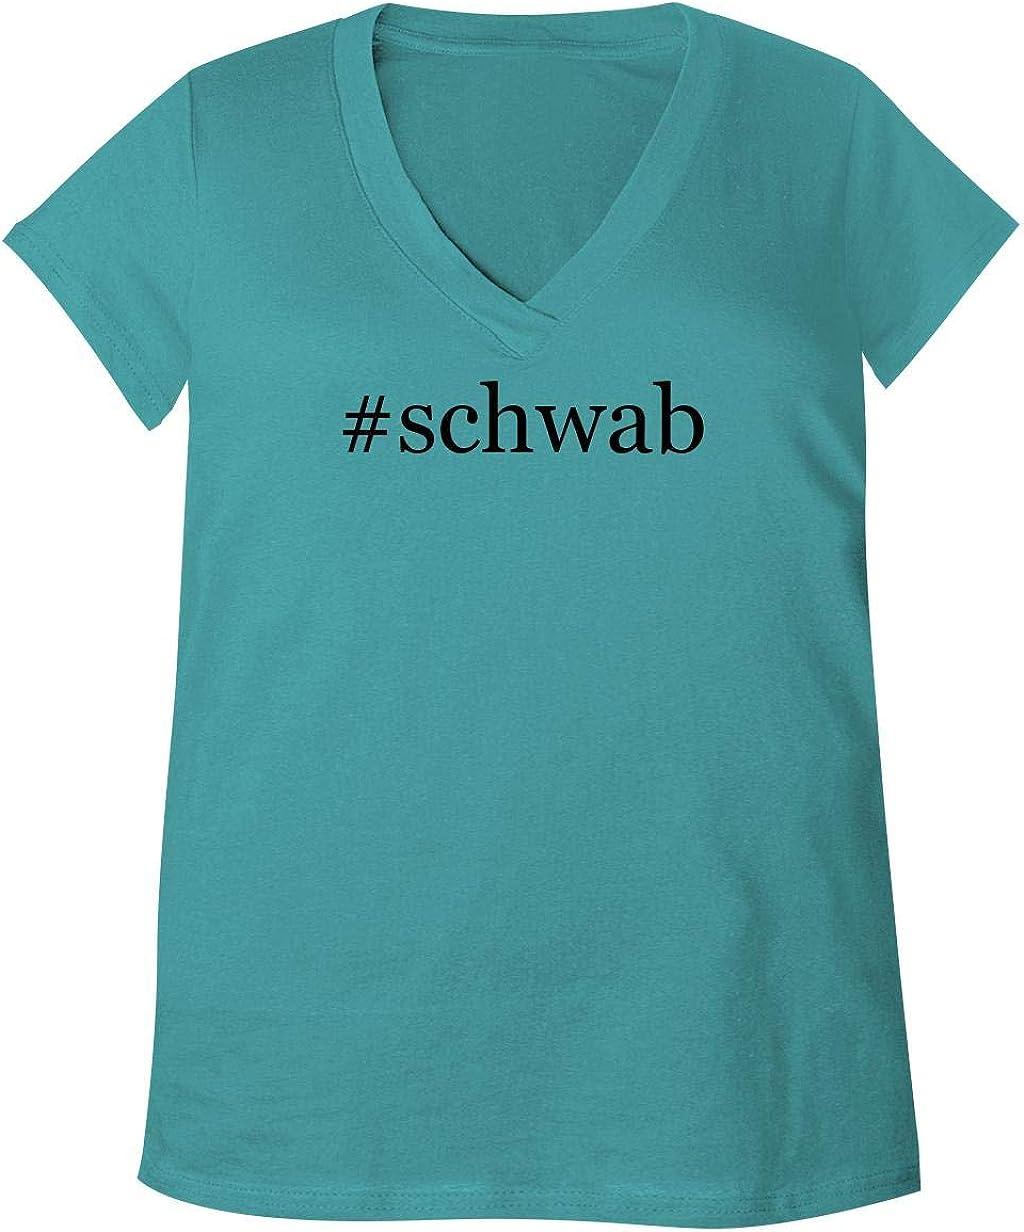 #Schwab - Adult Bella + Canvas B6035 Women'S V-Neck T-Shirt